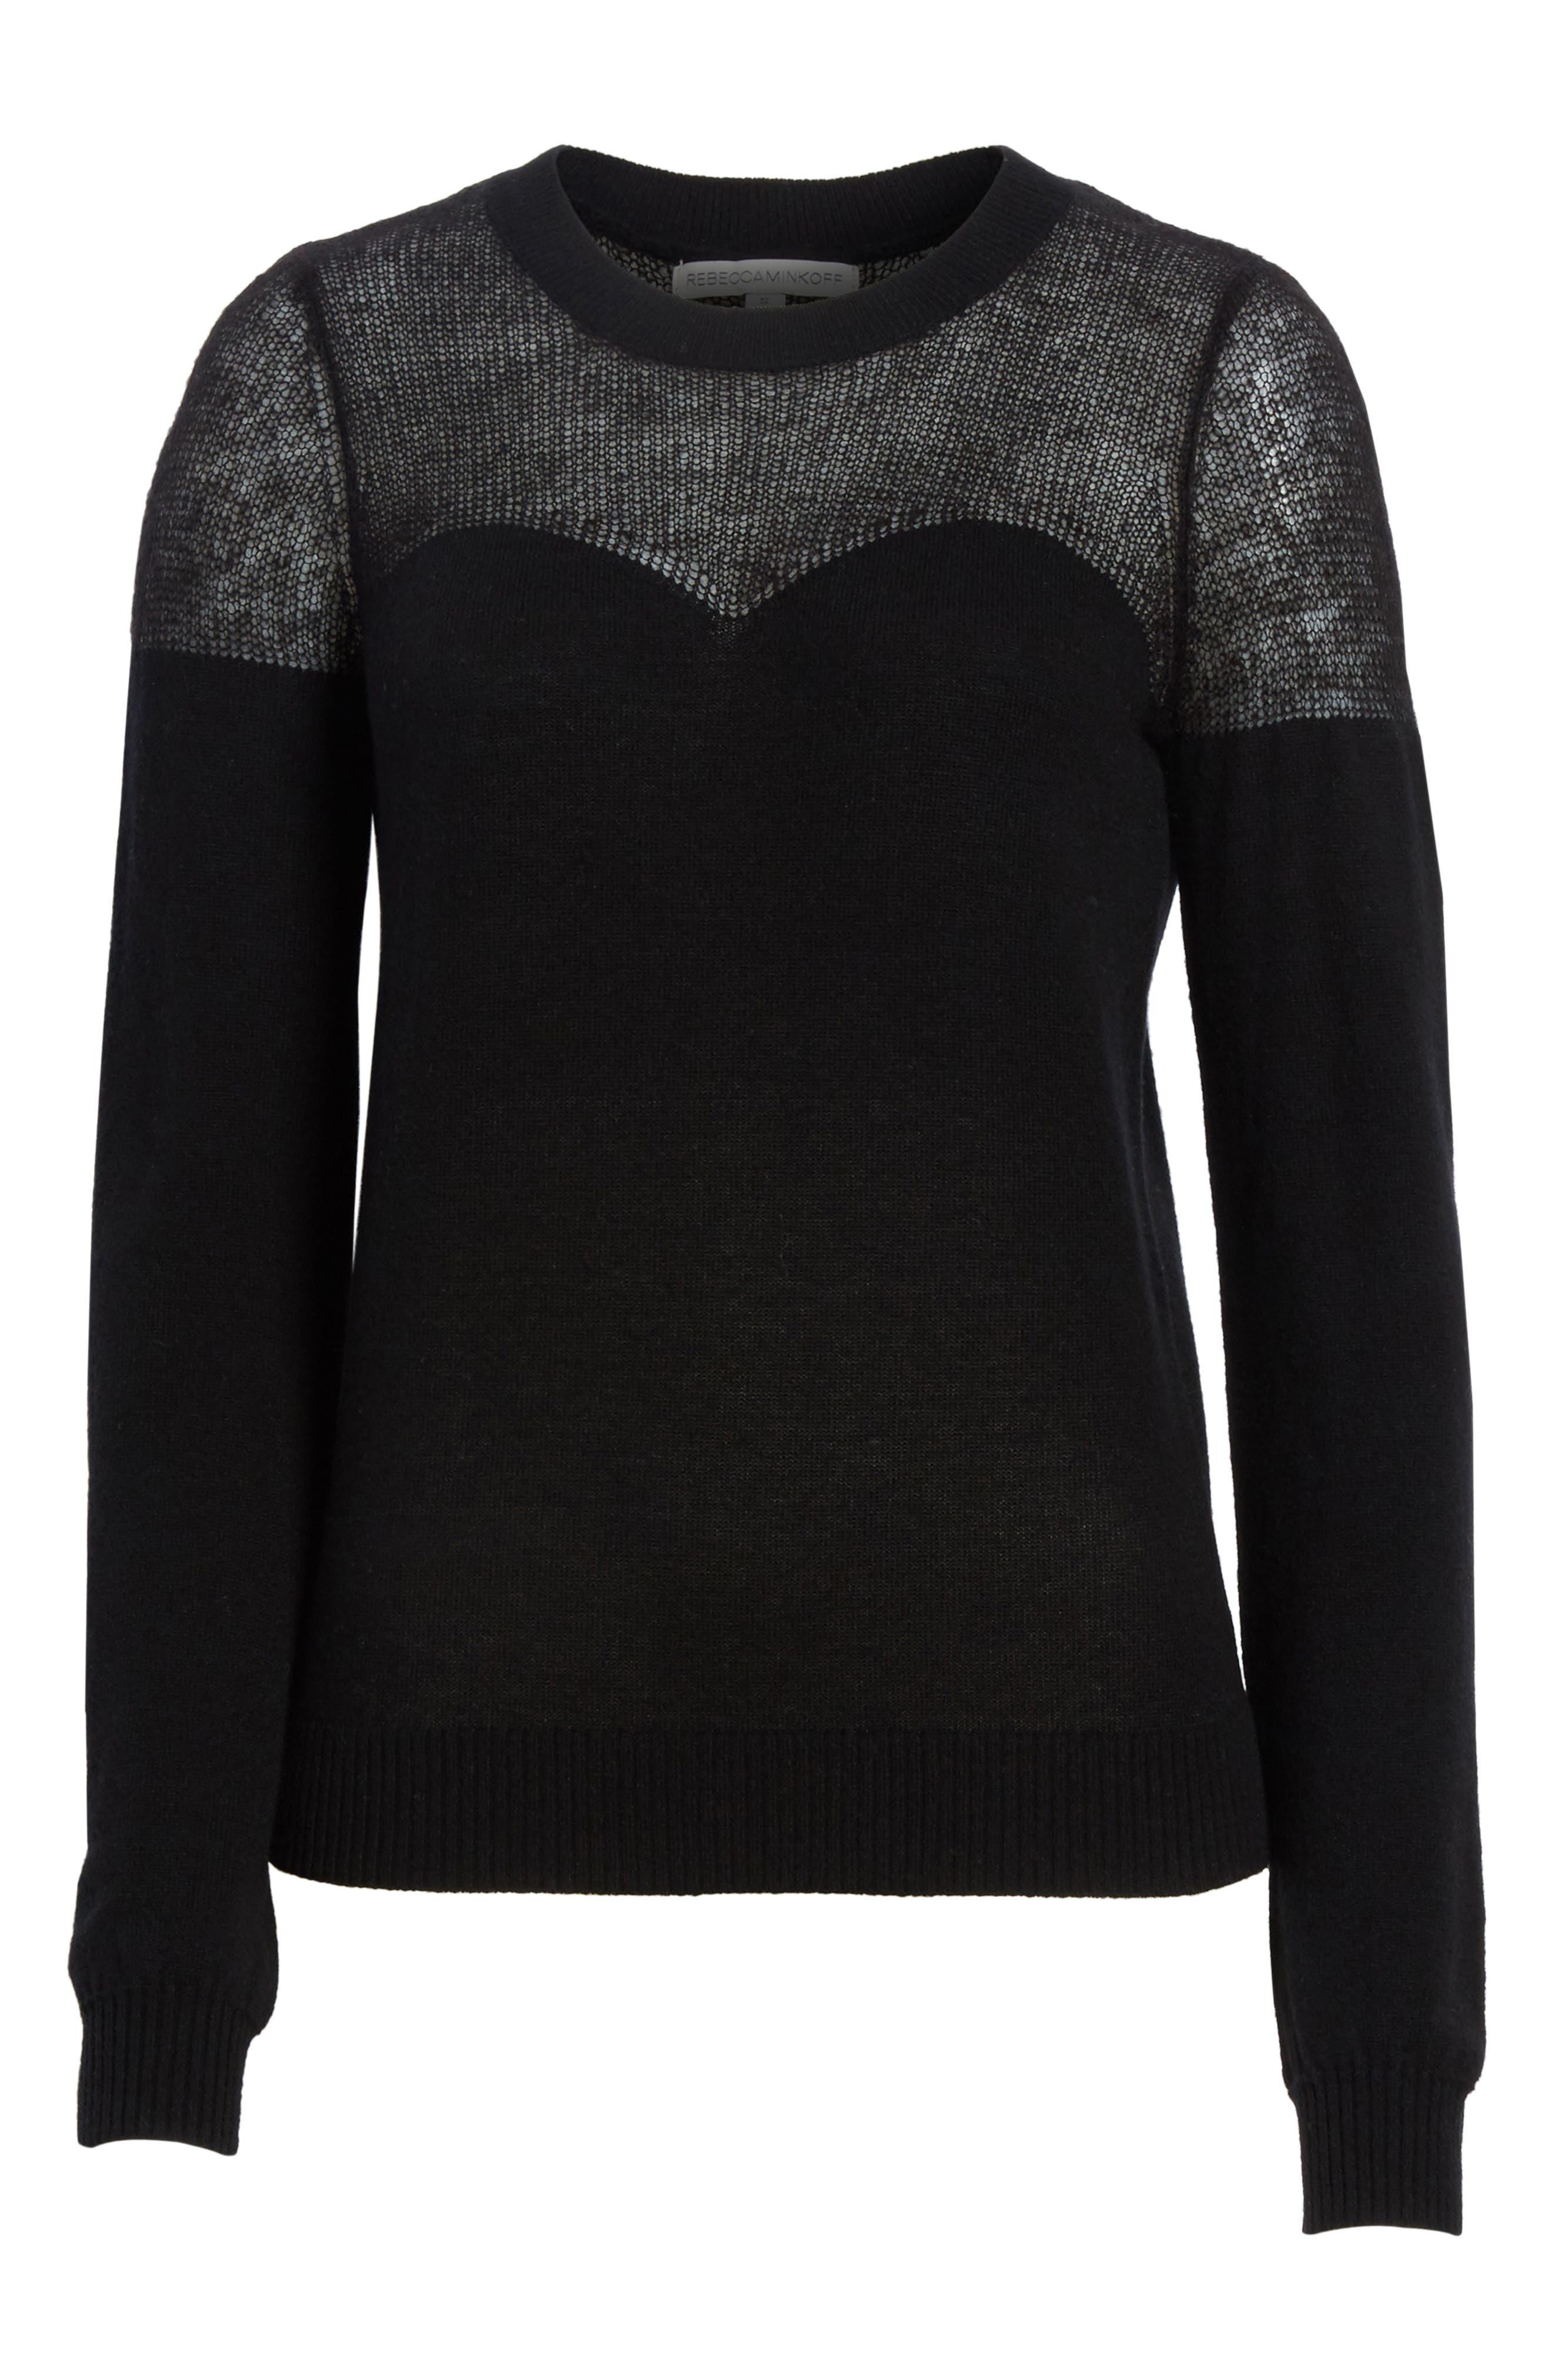 Clarence Sweater,                             Alternate thumbnail 6, color,                             Black Multi